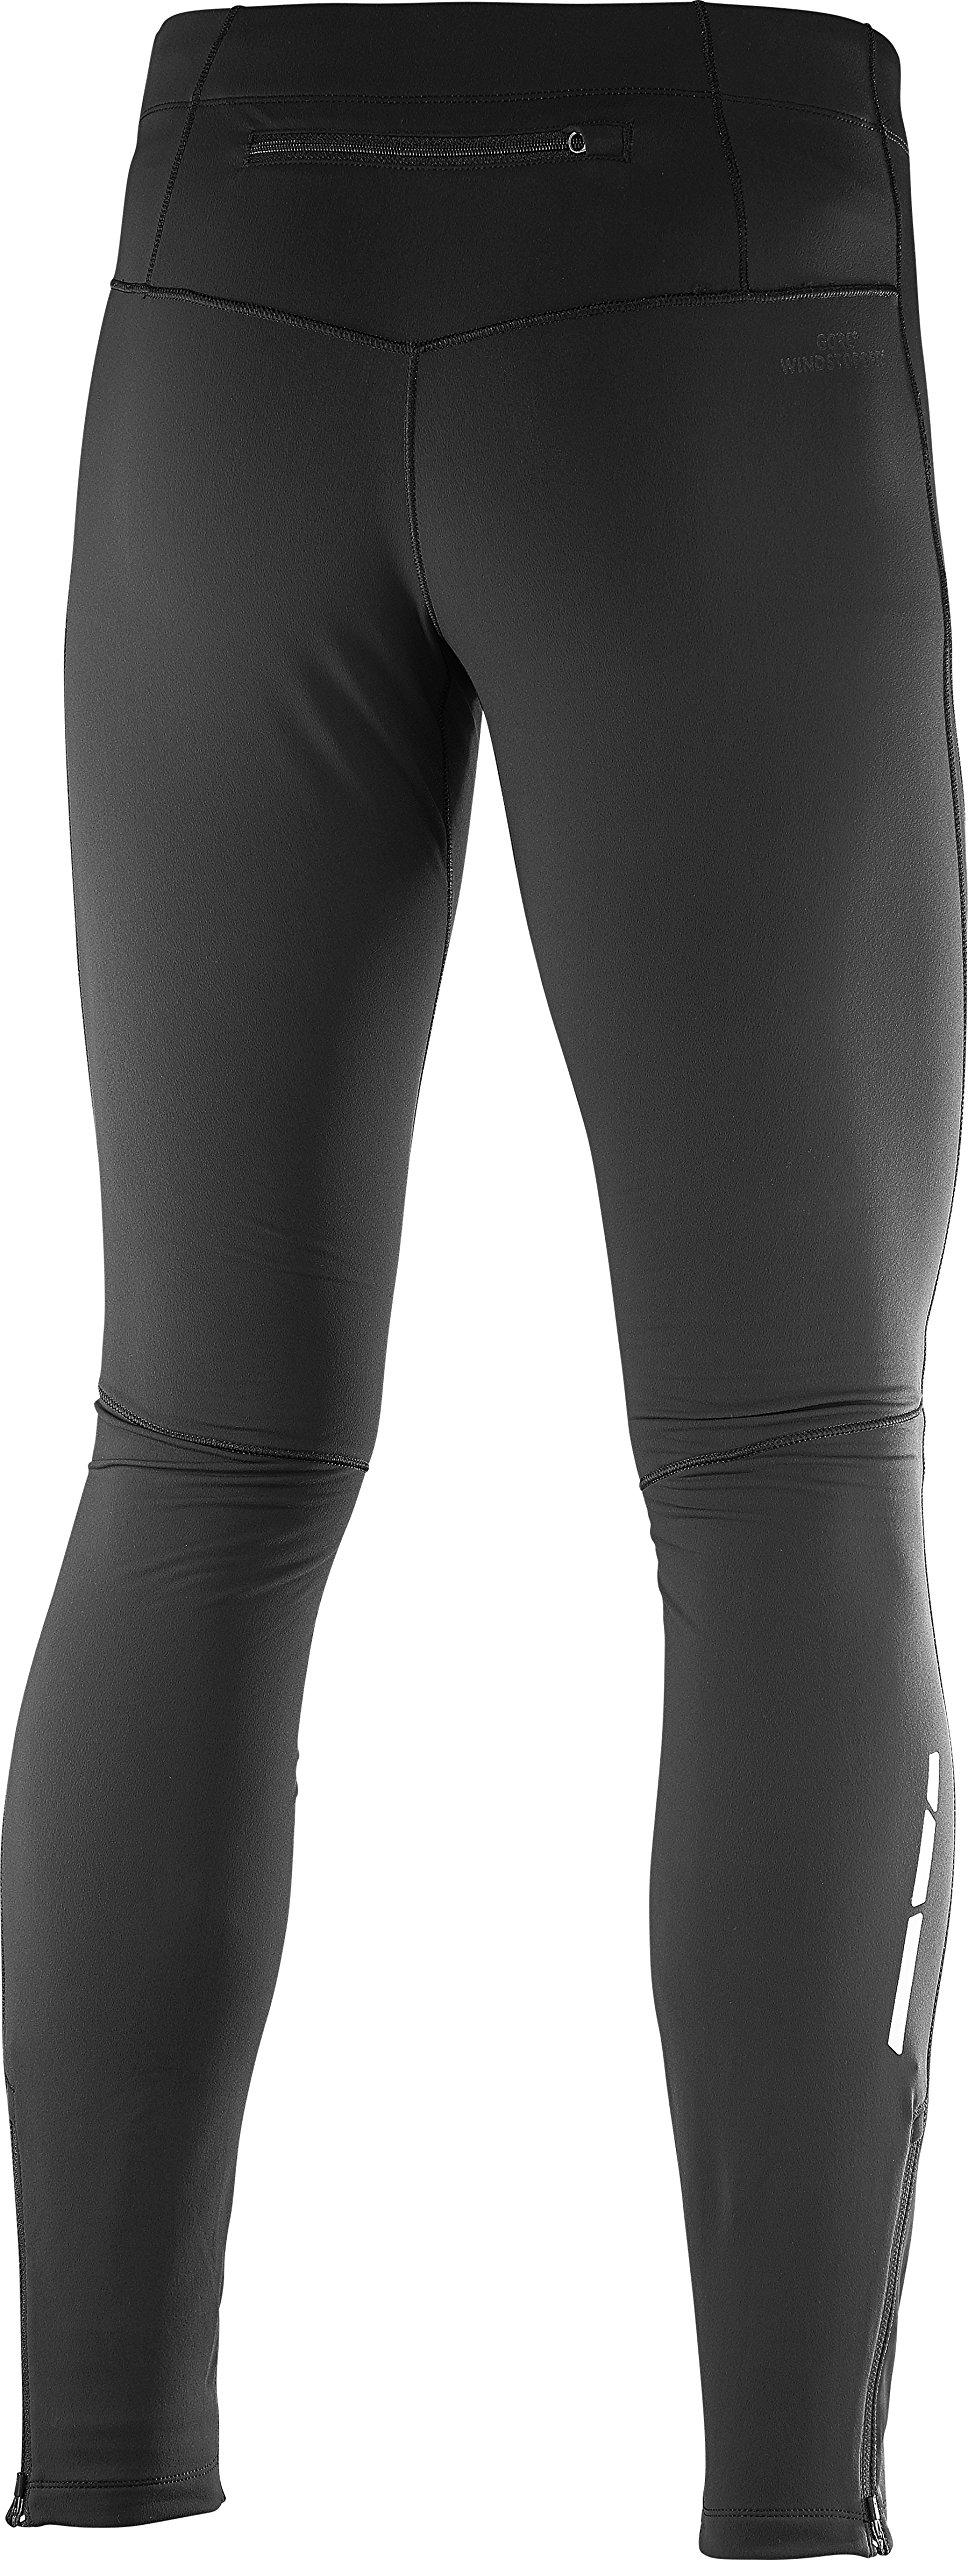 Salomon Men's Trail Runner WS Tight, Black, Large by Salomon (Image #2)